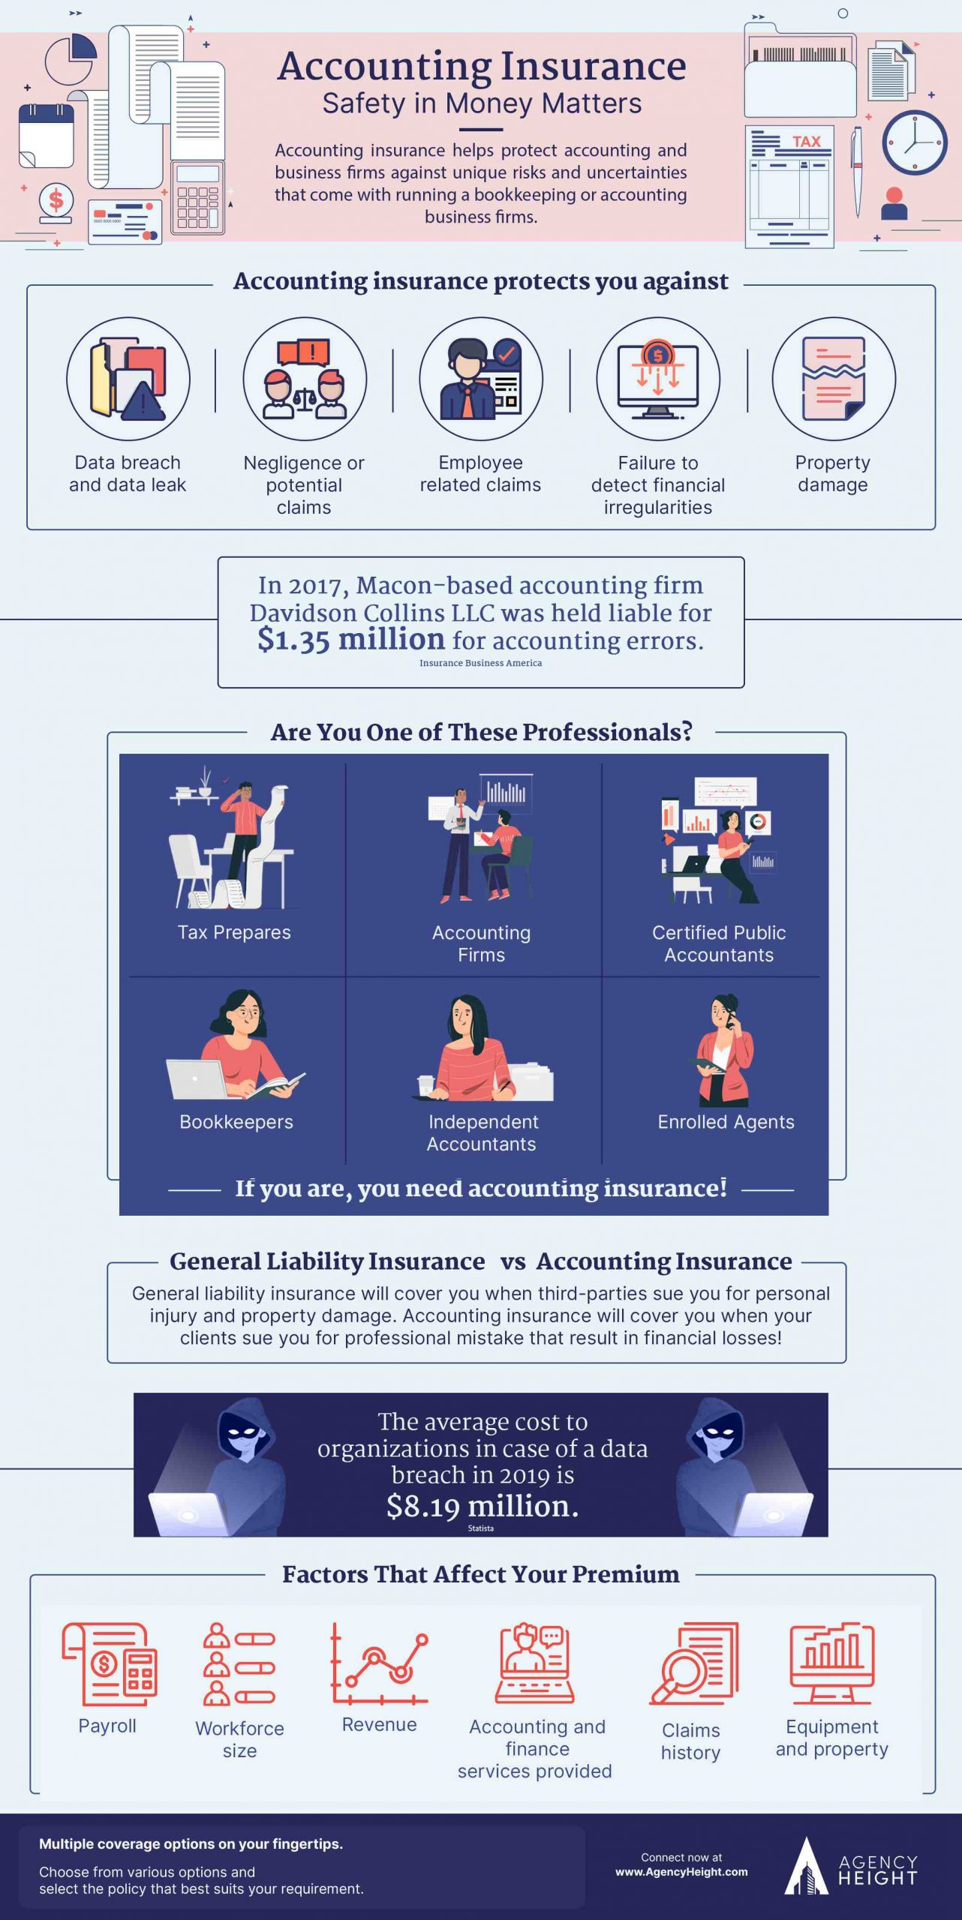 Accounting insurance